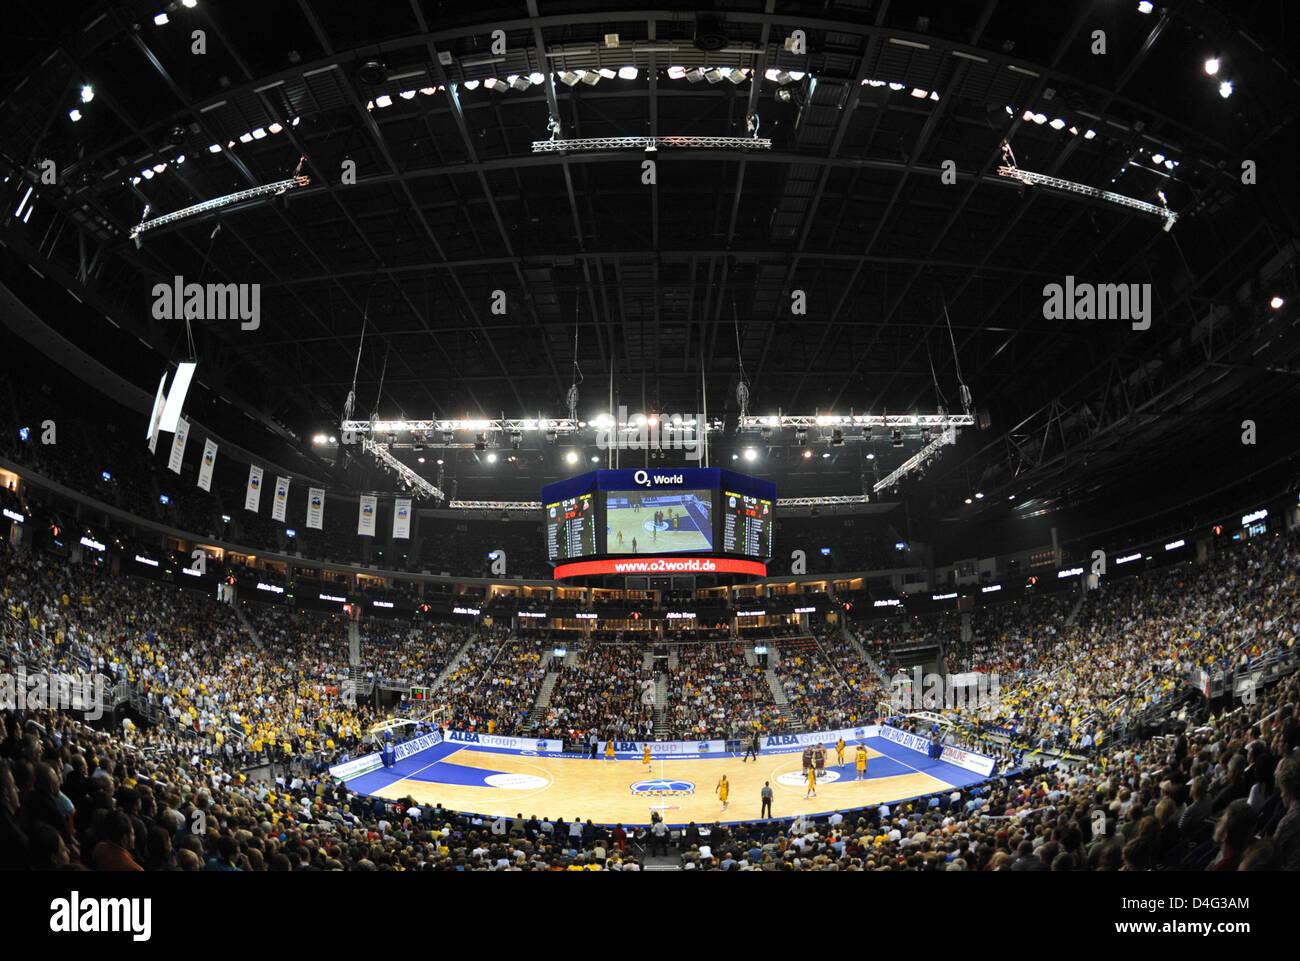 General view of the o2 arena stock photos general view of the o2 the picture shows the basketball bundesliga match alba berlin vs artland dragons at o2 arena publicscrutiny Choice Image